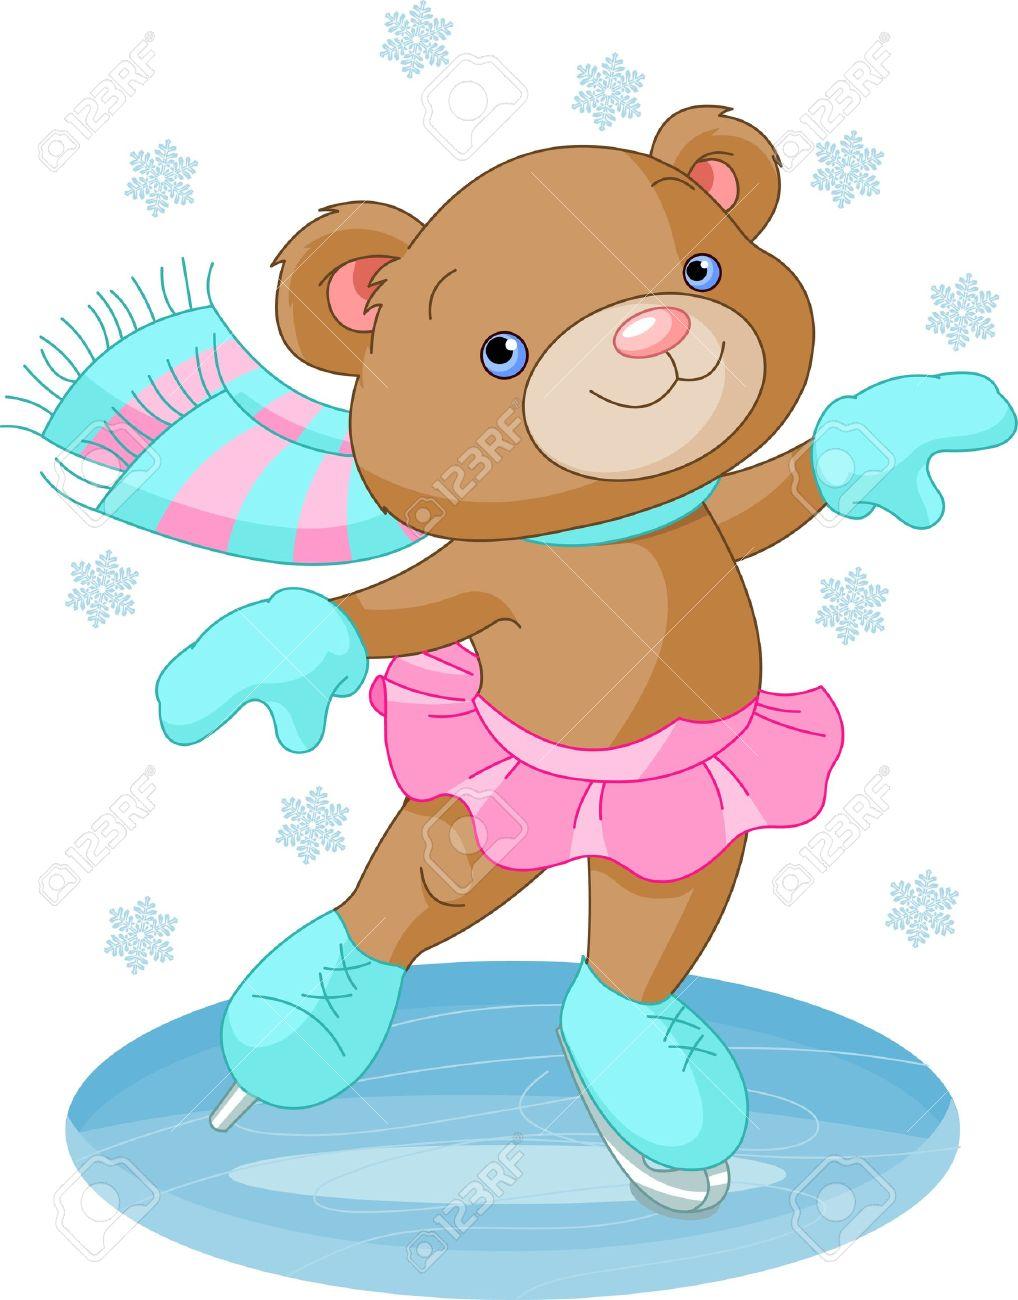 Illustration of cute bear girl on ice skates Stock Vector - 11844701